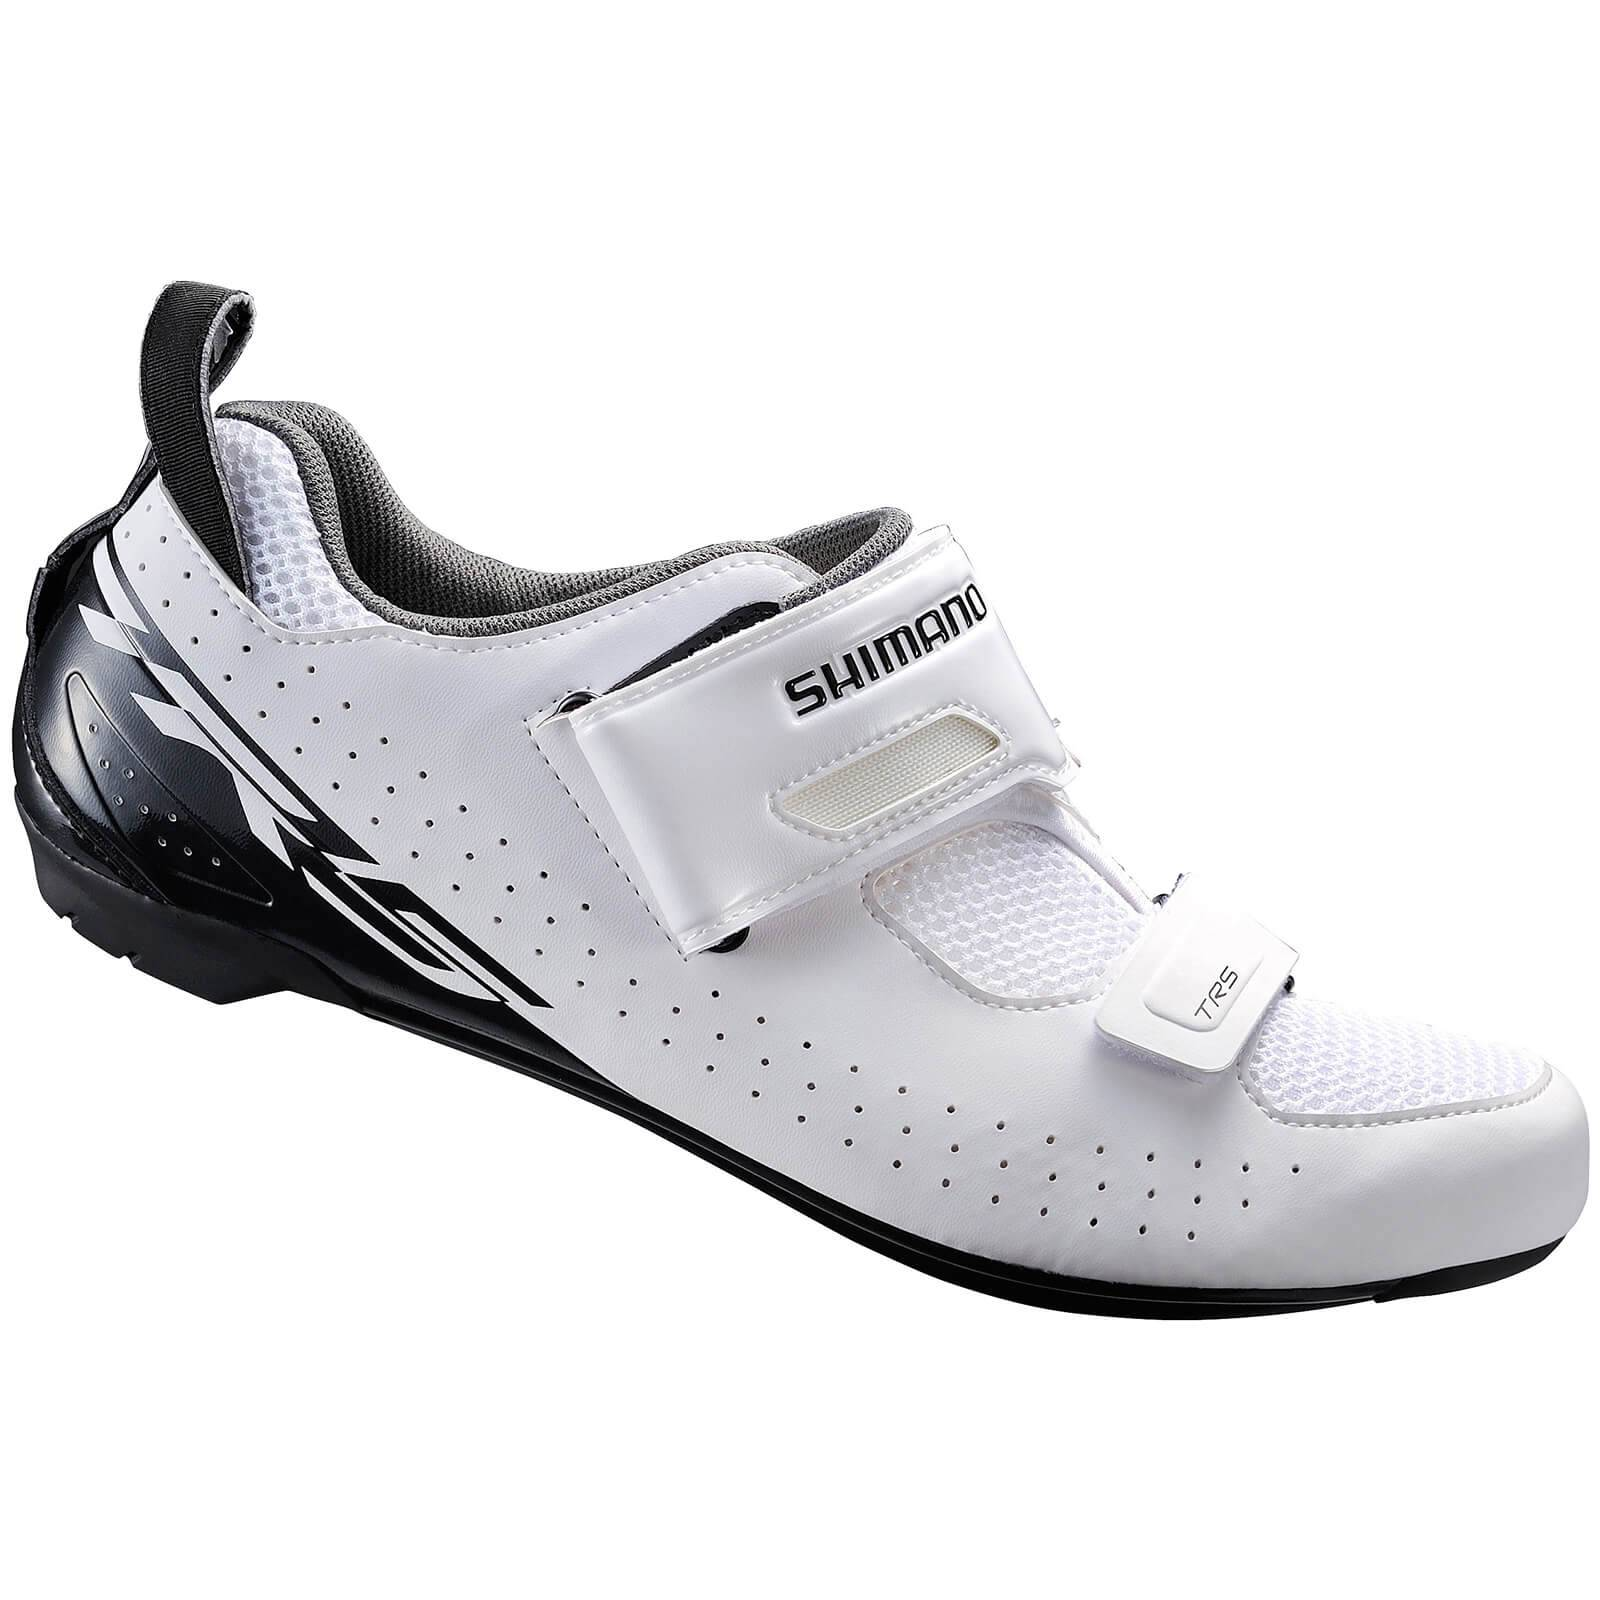 Shimano TR5 SPD-SL Triathlon Shoes - White - EU 47 - White